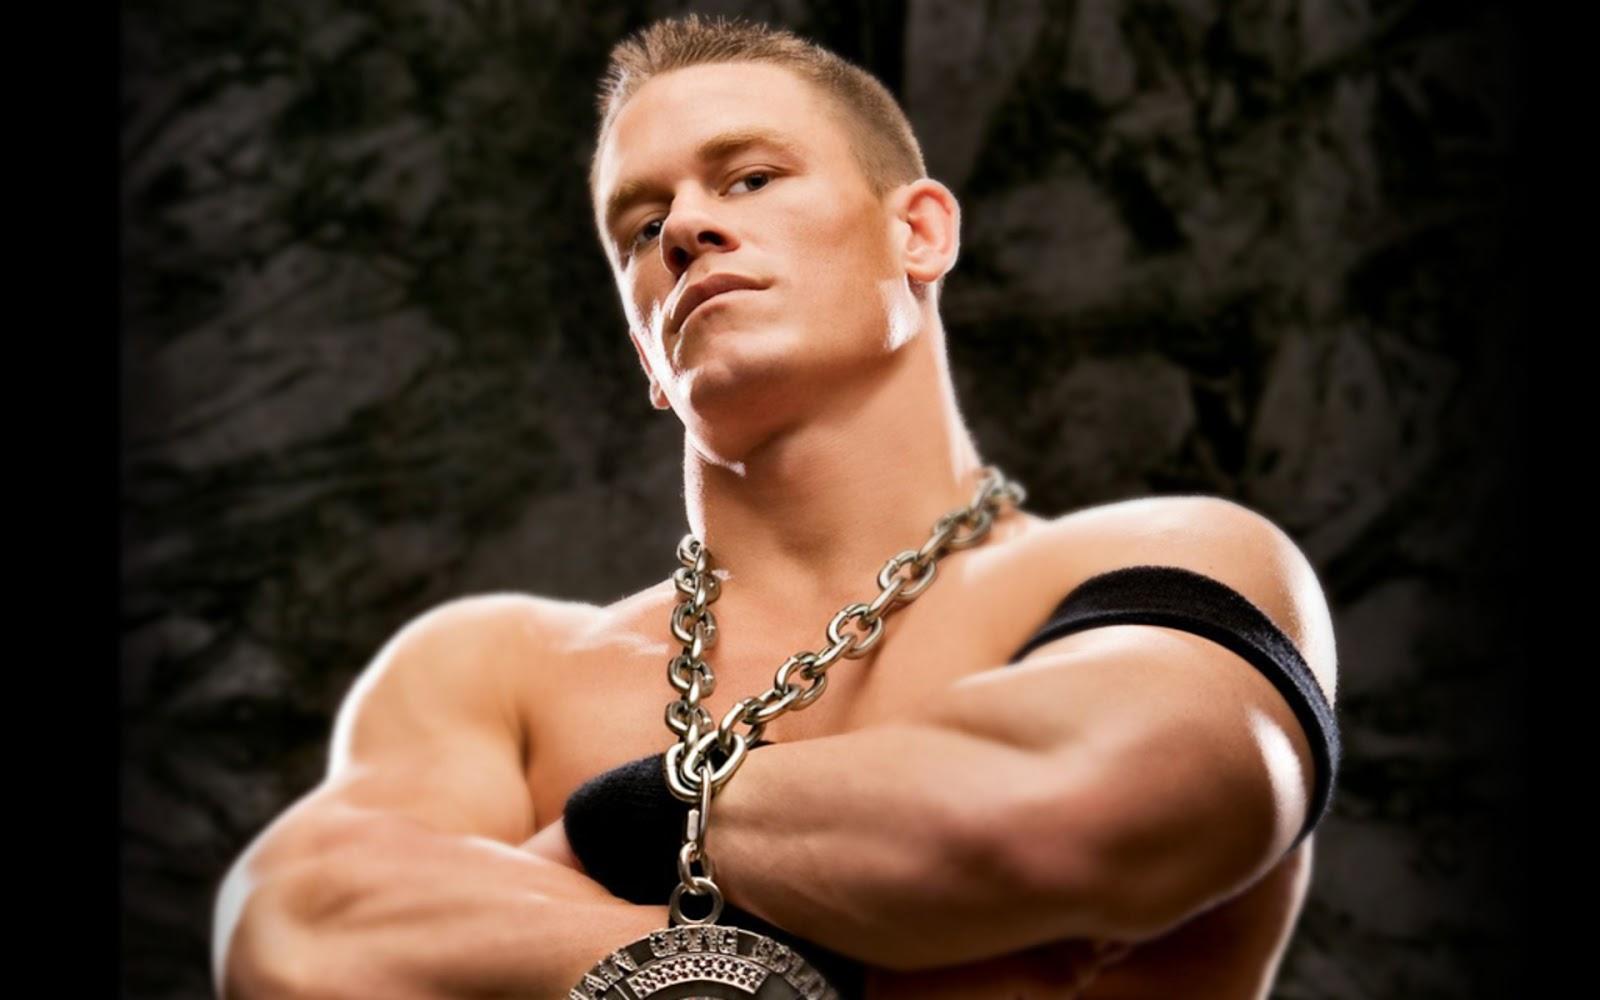 Rave Up Music Wrassle Palooza John Cena You Cant See Me